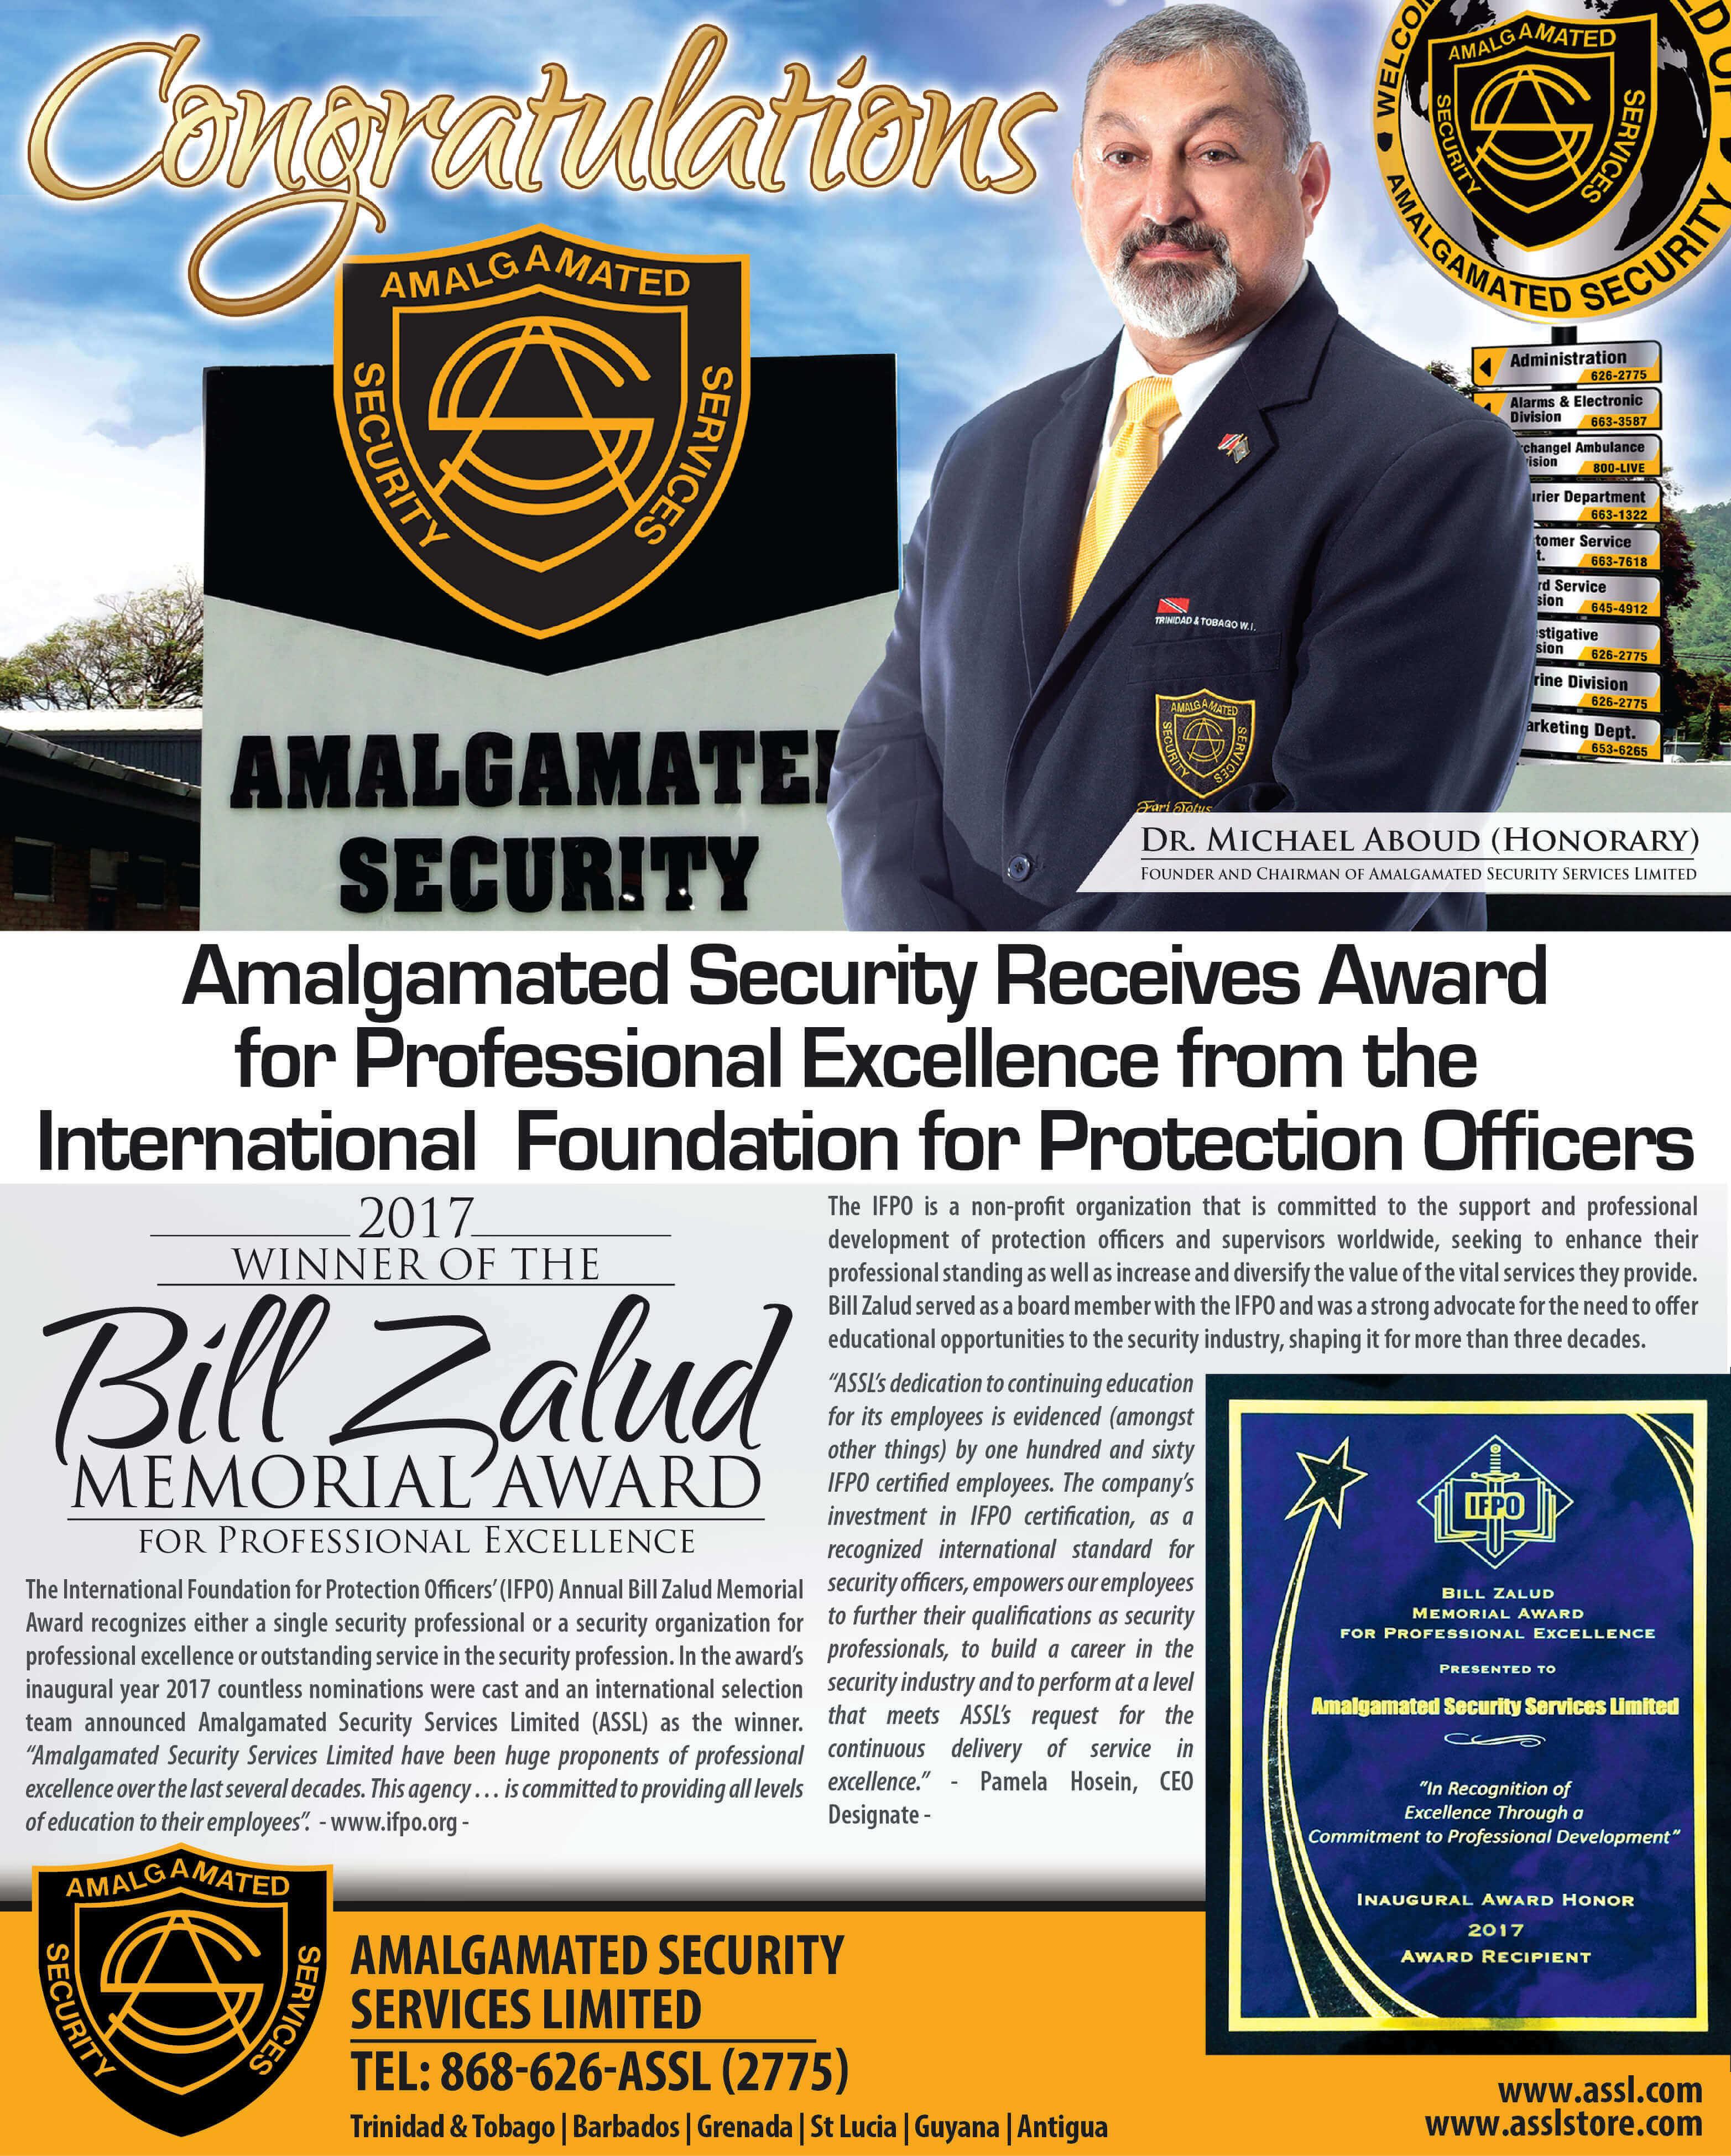 Amalgamated Security Services Limited - Cash Services Unit